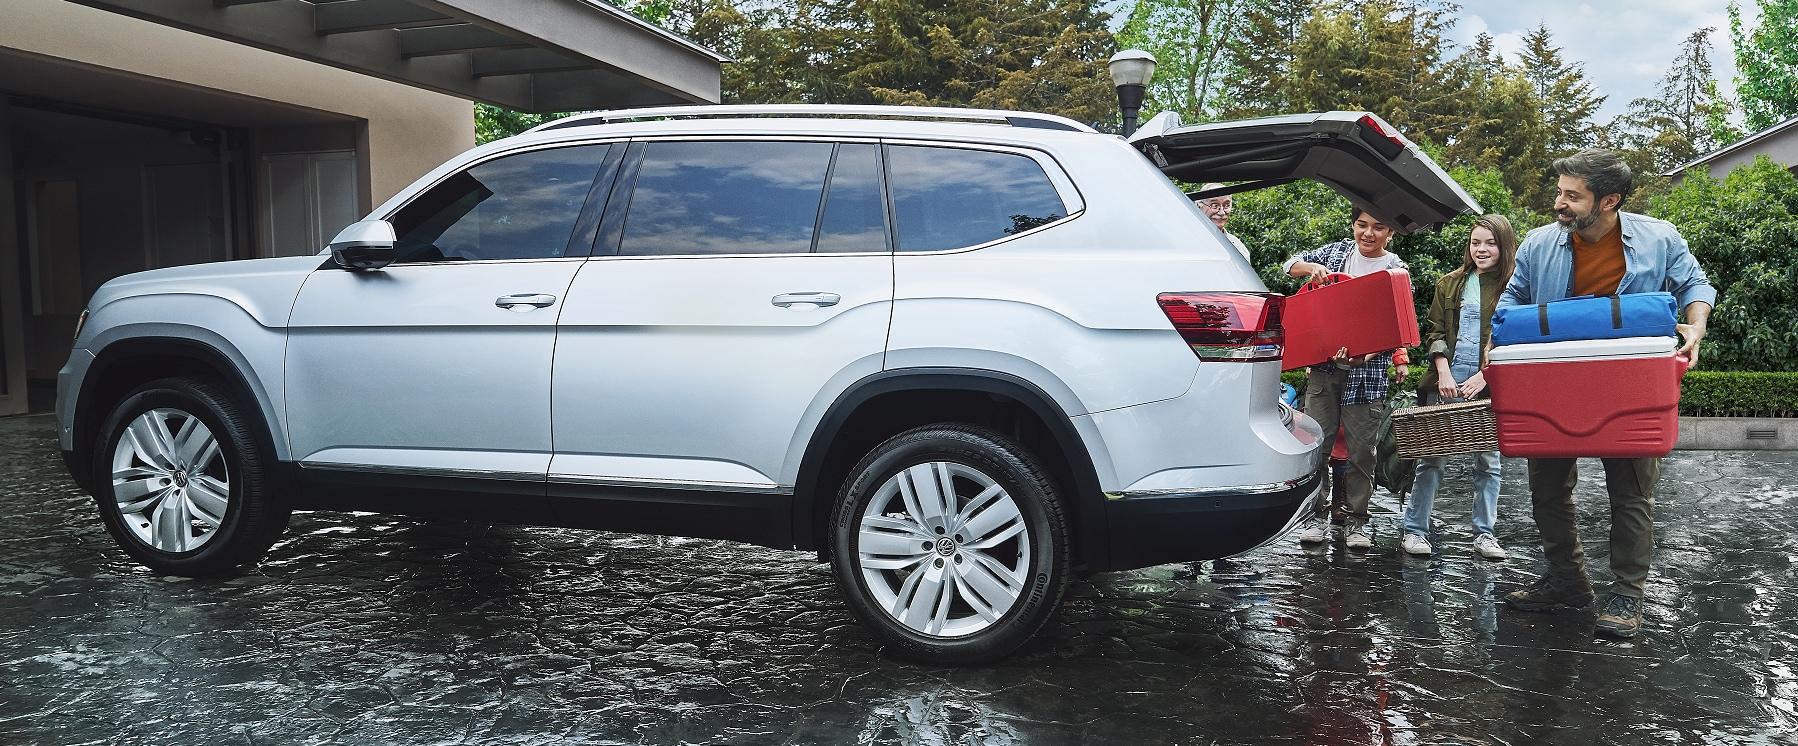 2019 Volkswagen Atlas For Sale In Silver Spring At Darcars Vw